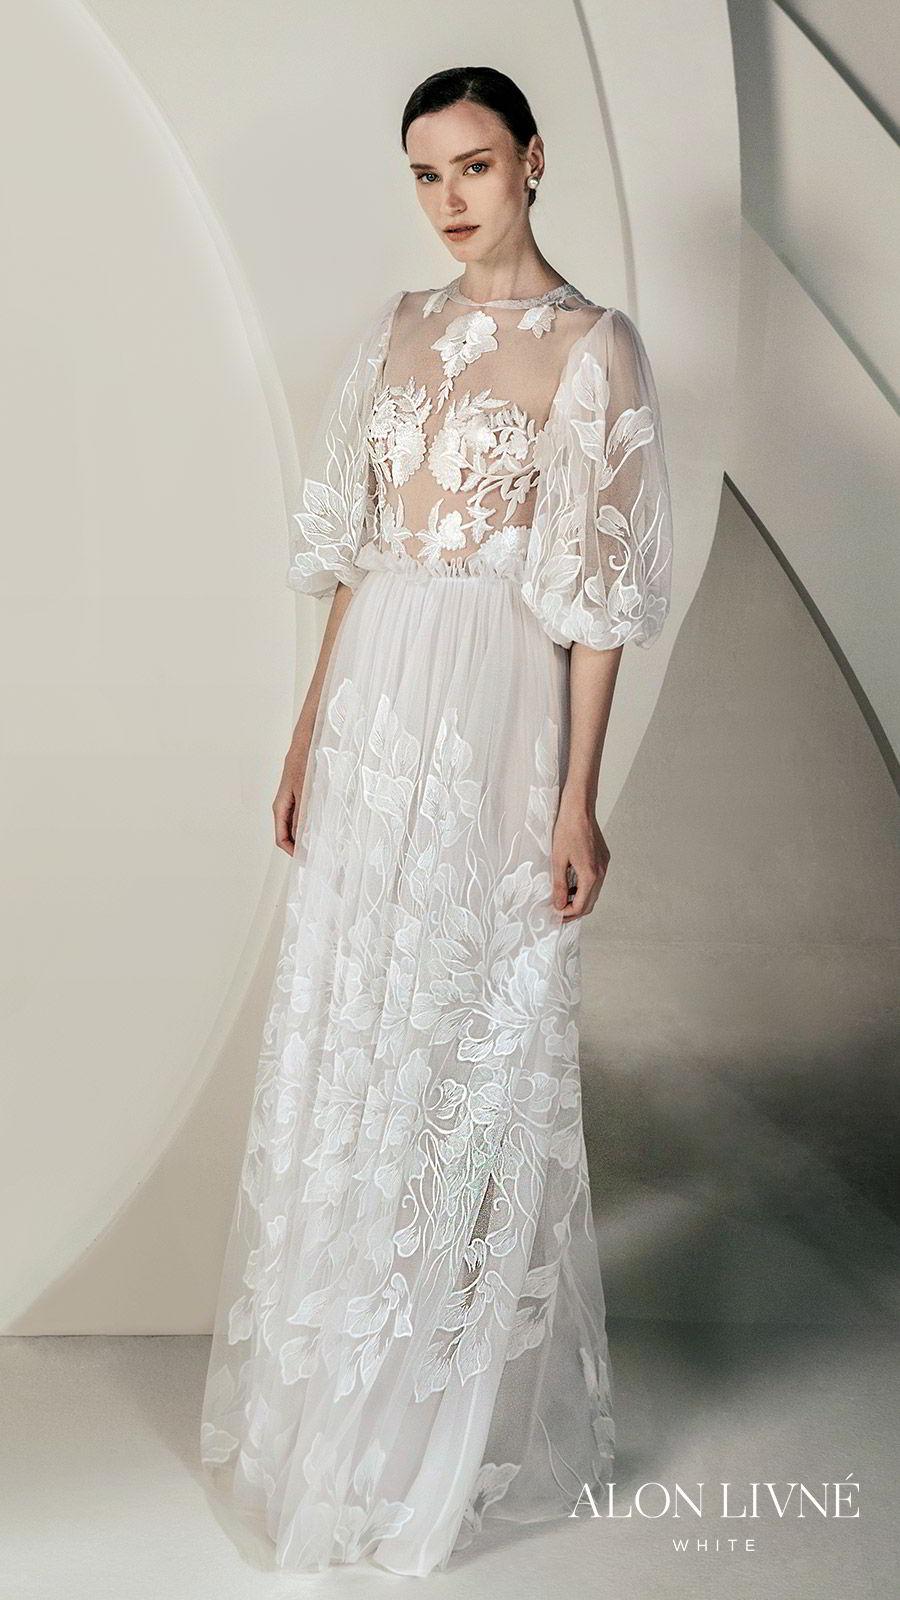 cbe26d3a218d alon livne white spring 2020 bridal 3 quarter illusion puff sleeves jewel  neckline sheer bodice fully